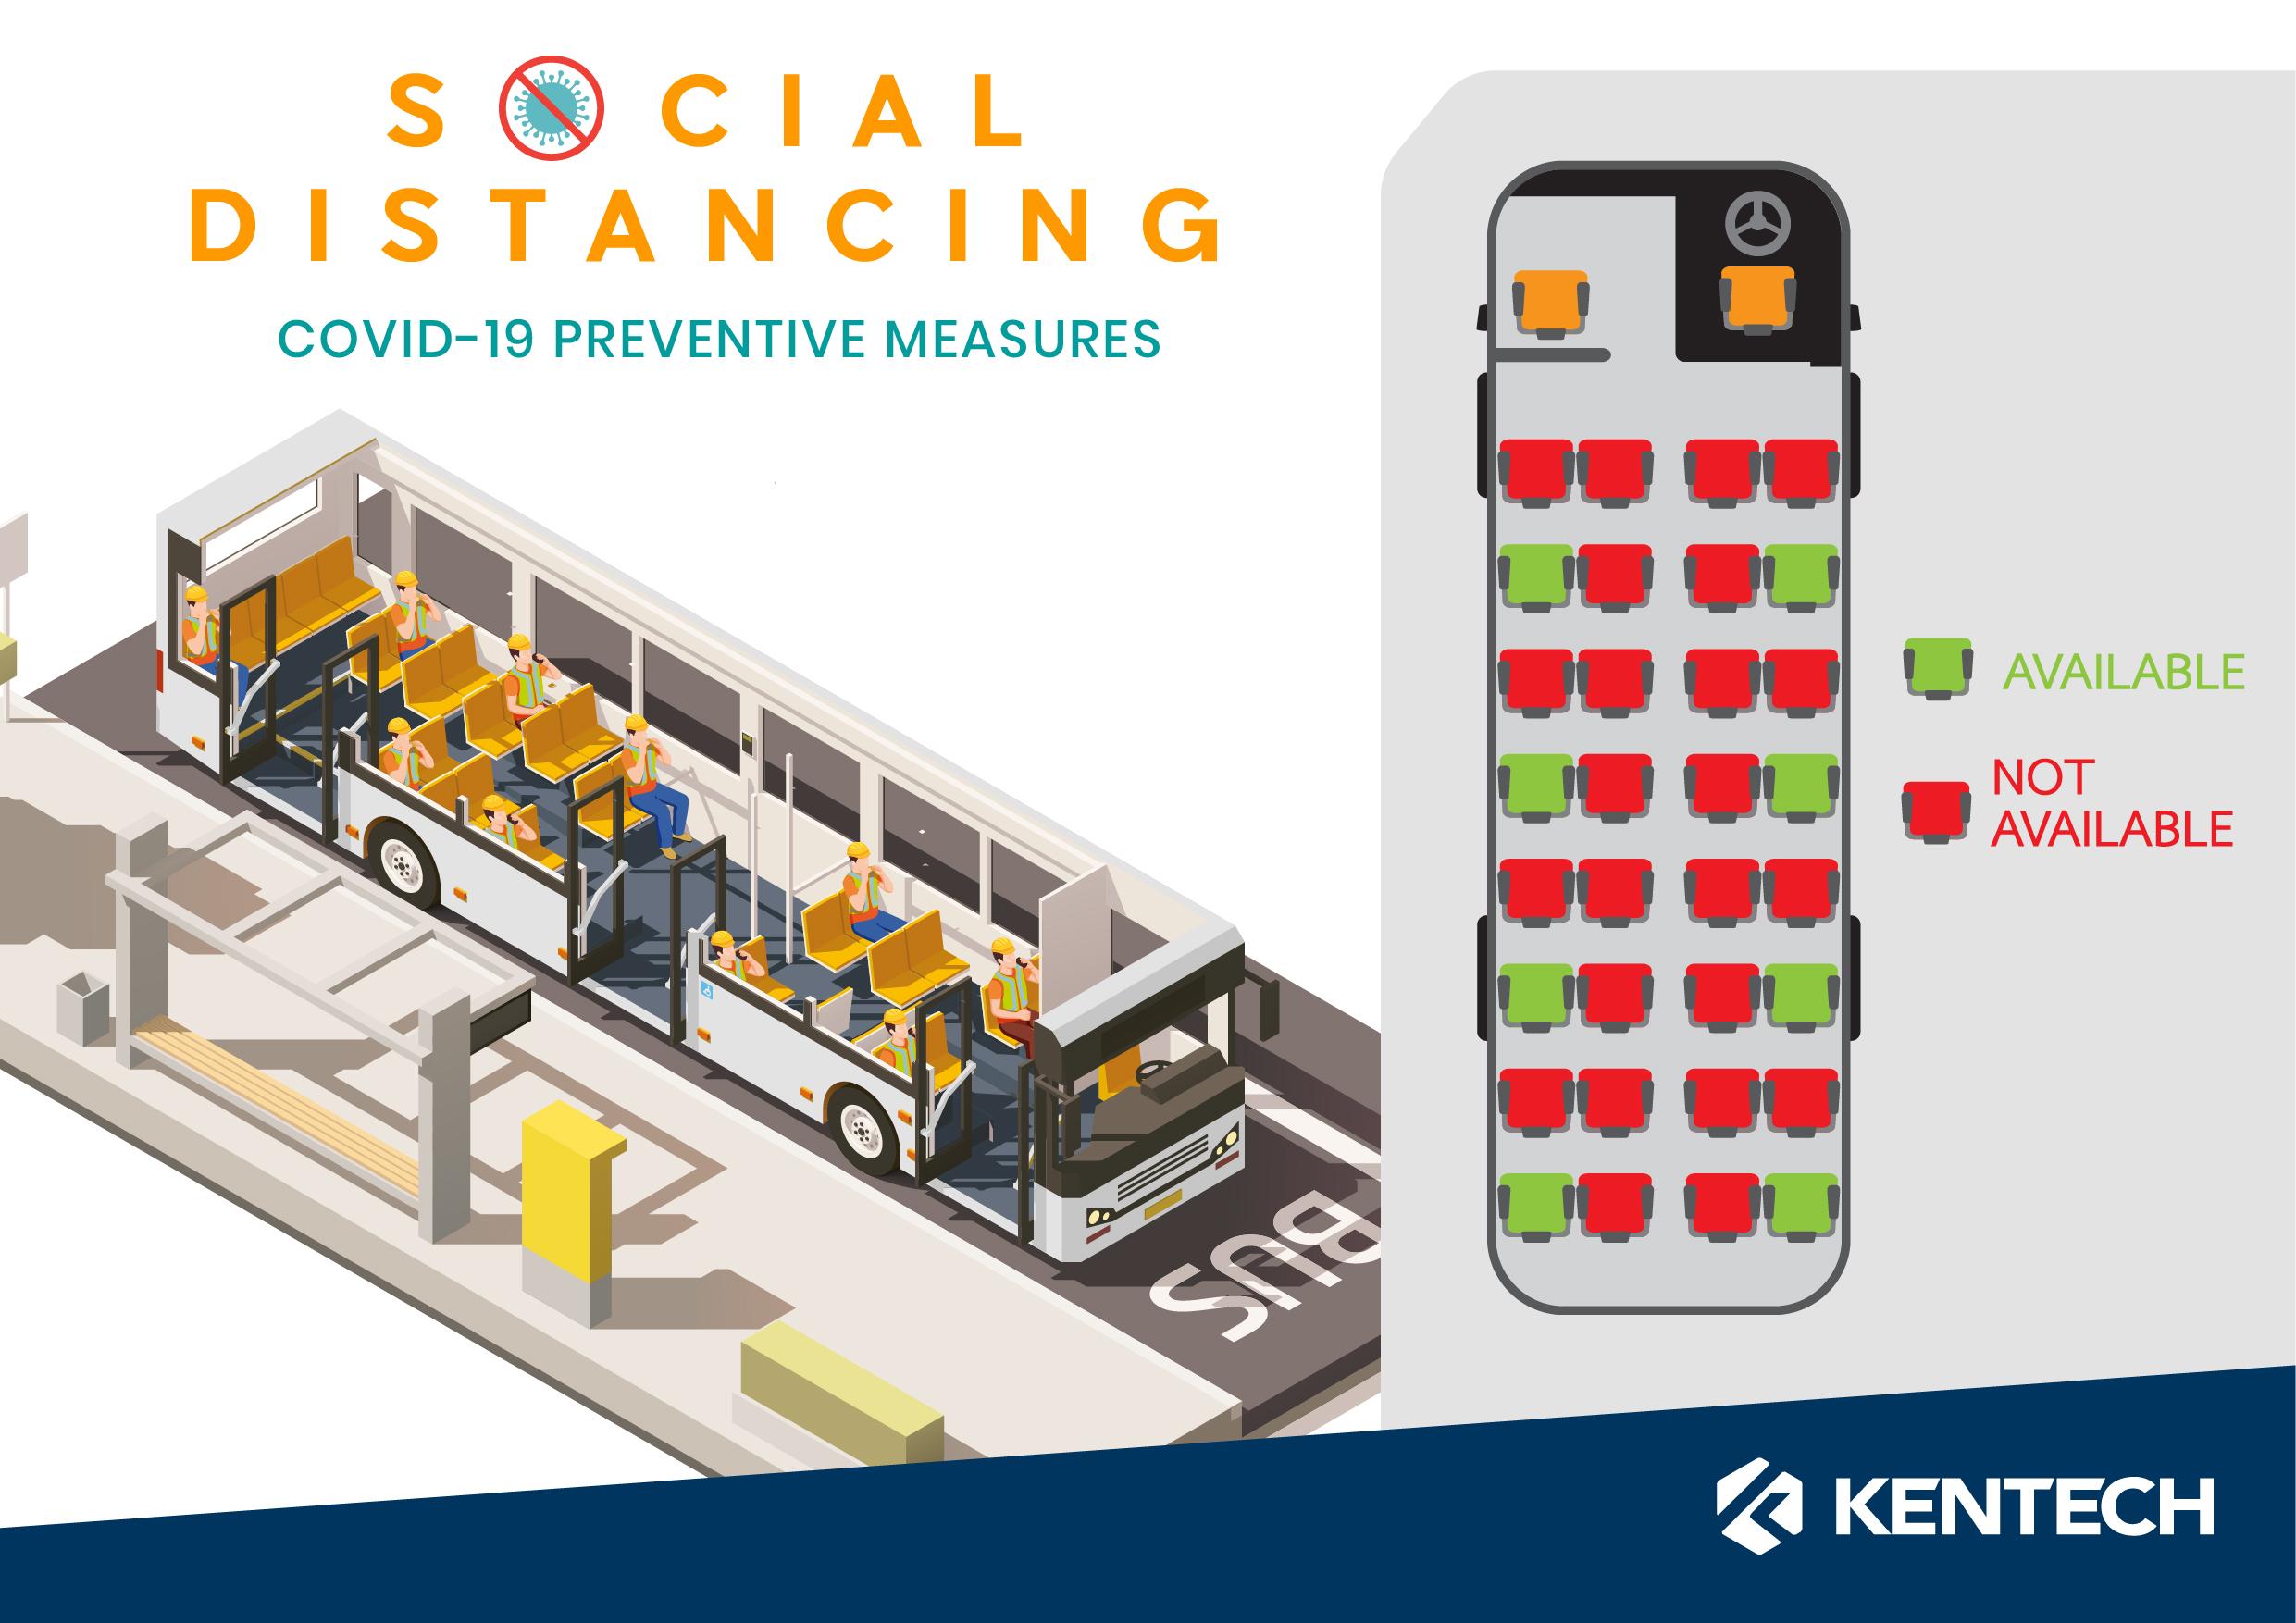 Kentech_Covid-19_SocialDistance-07-01